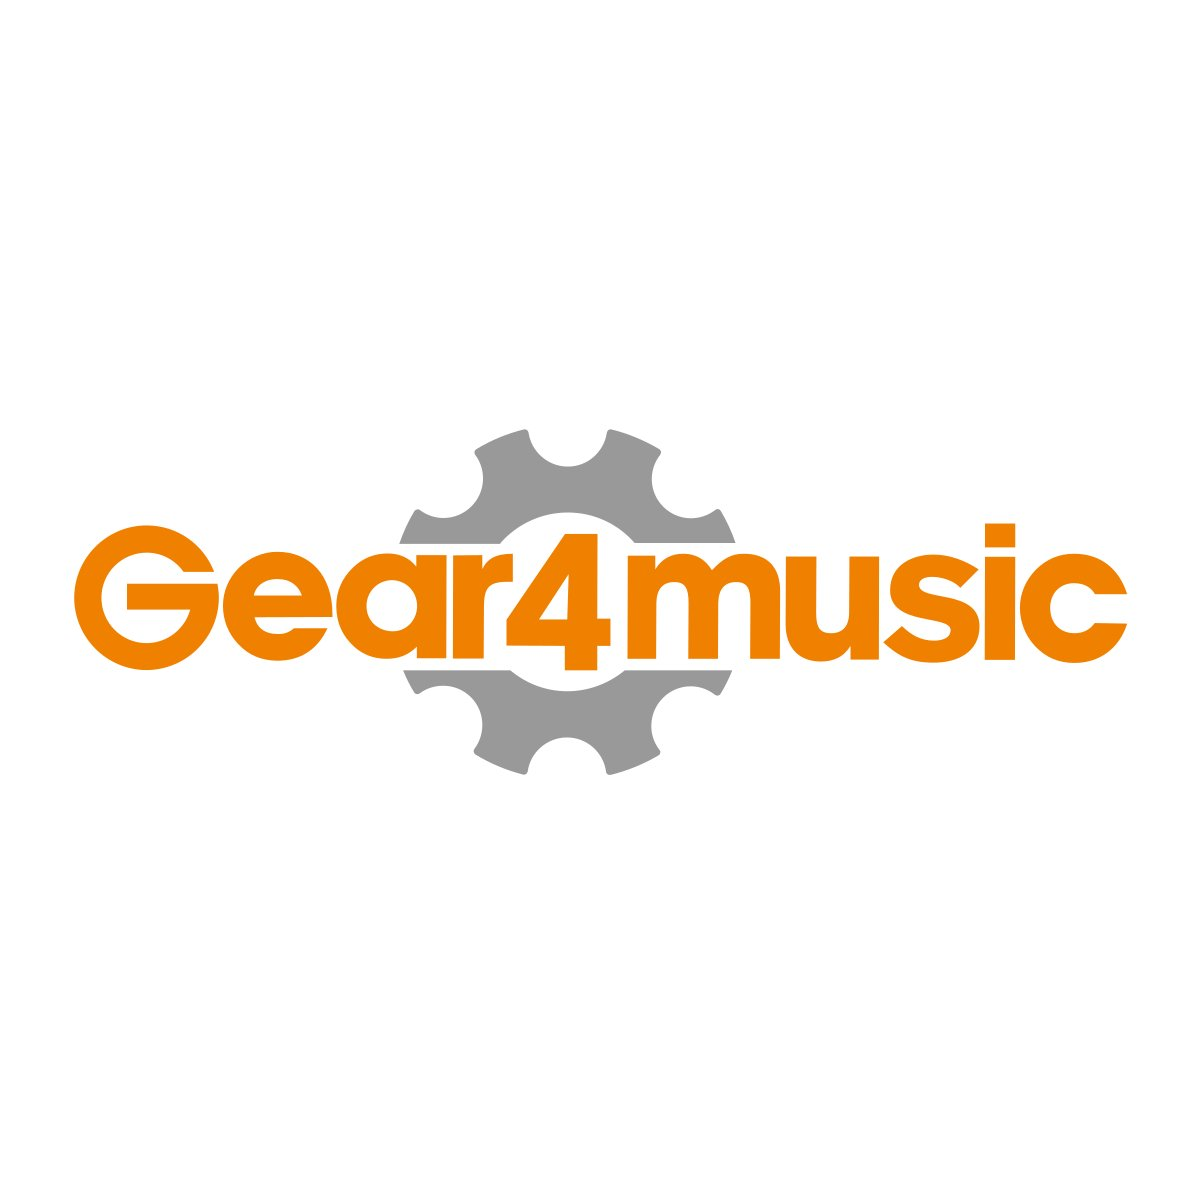 BDK-1 Full Size Starter Drum Kit by Gear4music, Red